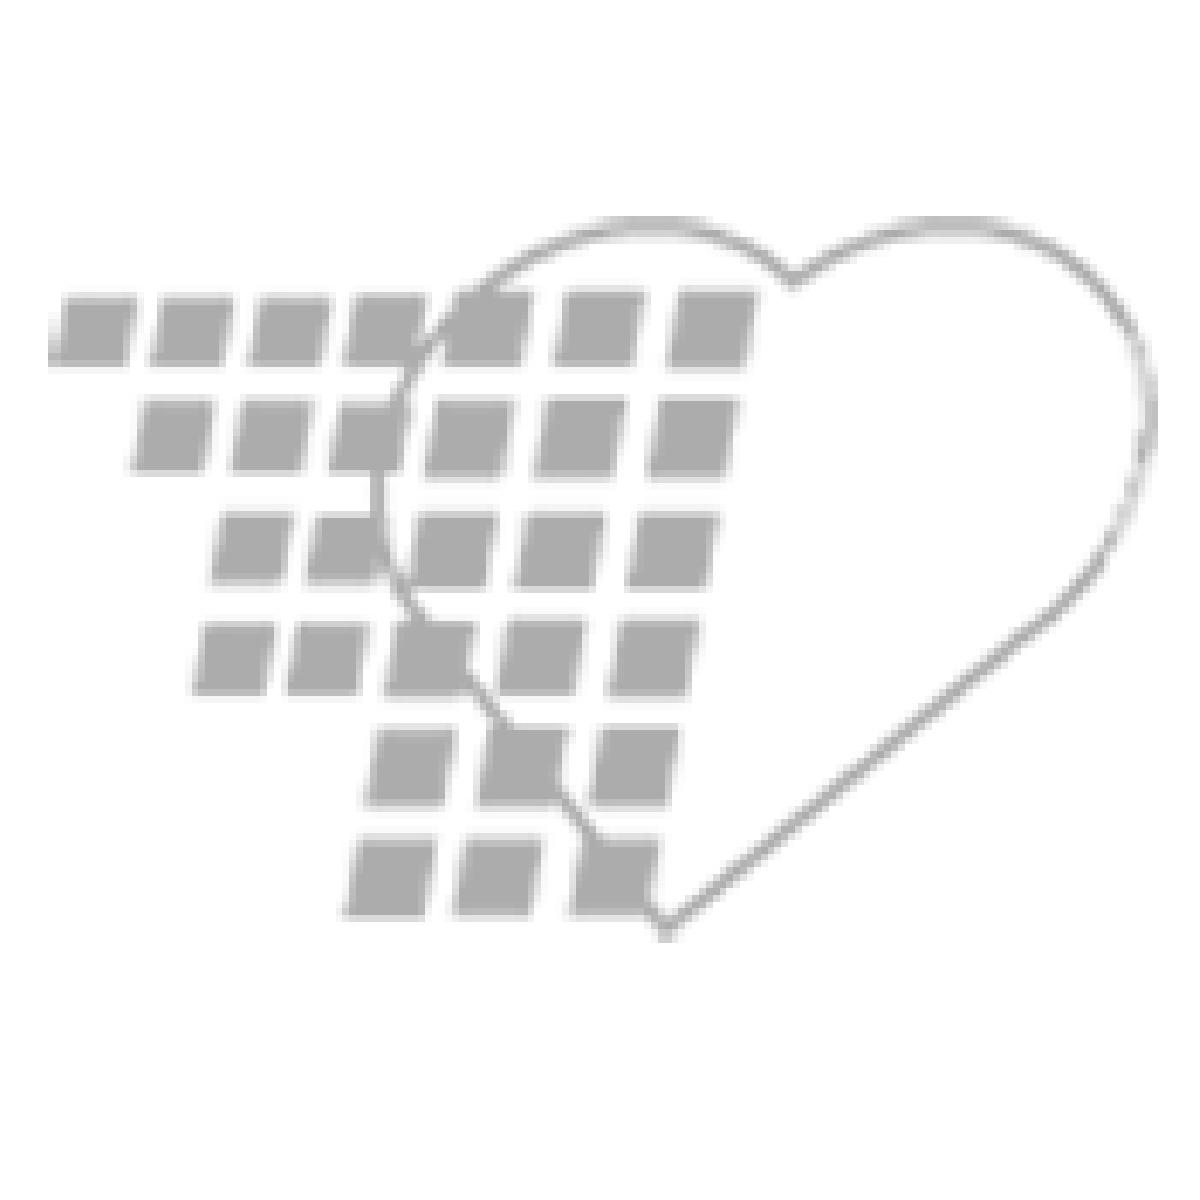 02-43-9001 ECG Recording Paper for 02-43-9000